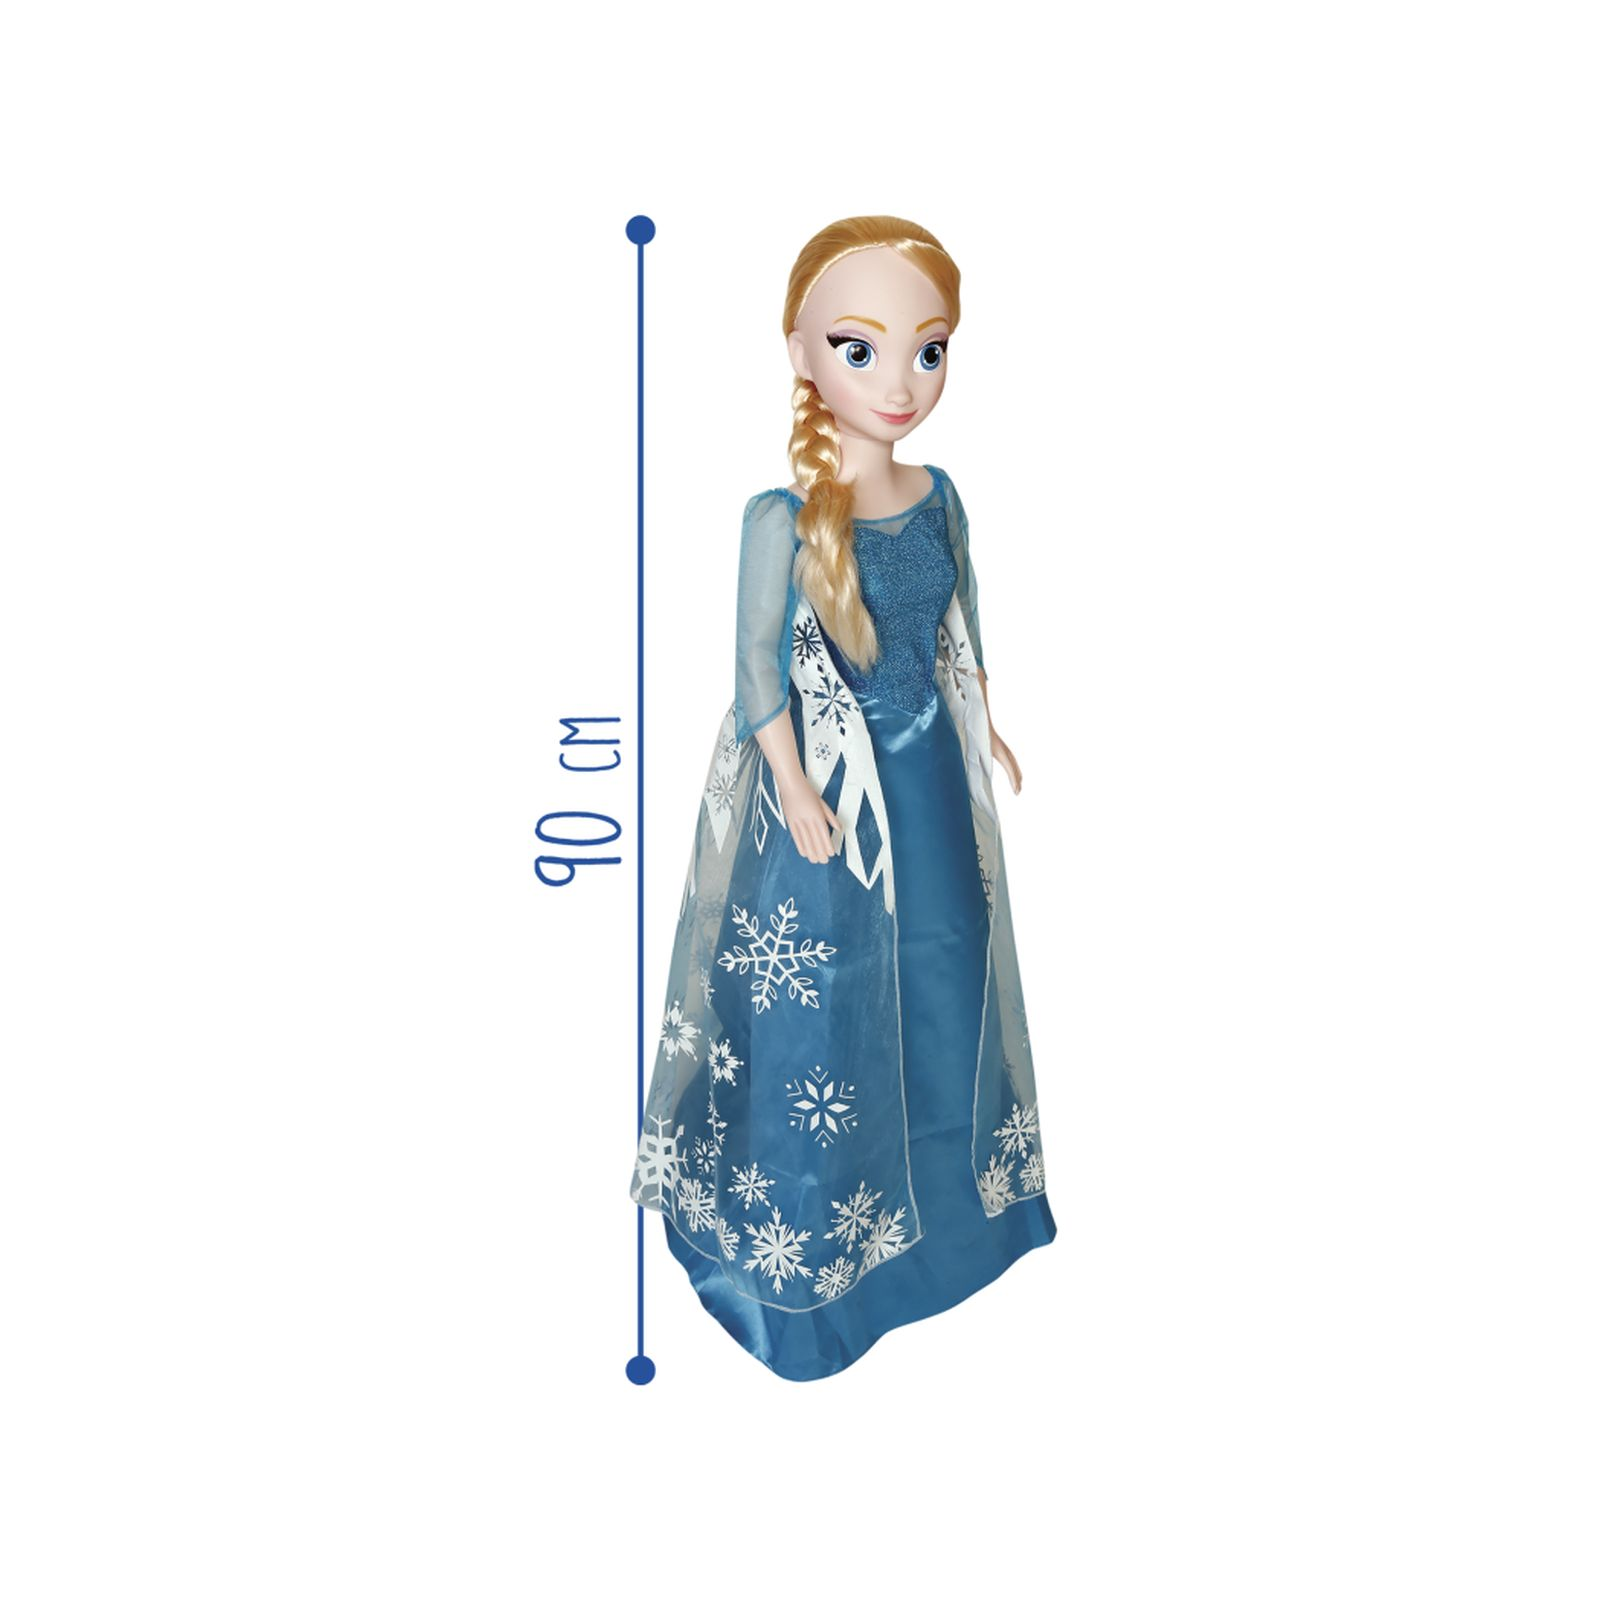 Bambola elsa 90cm - PRINCIPESSE WALT DISNEY